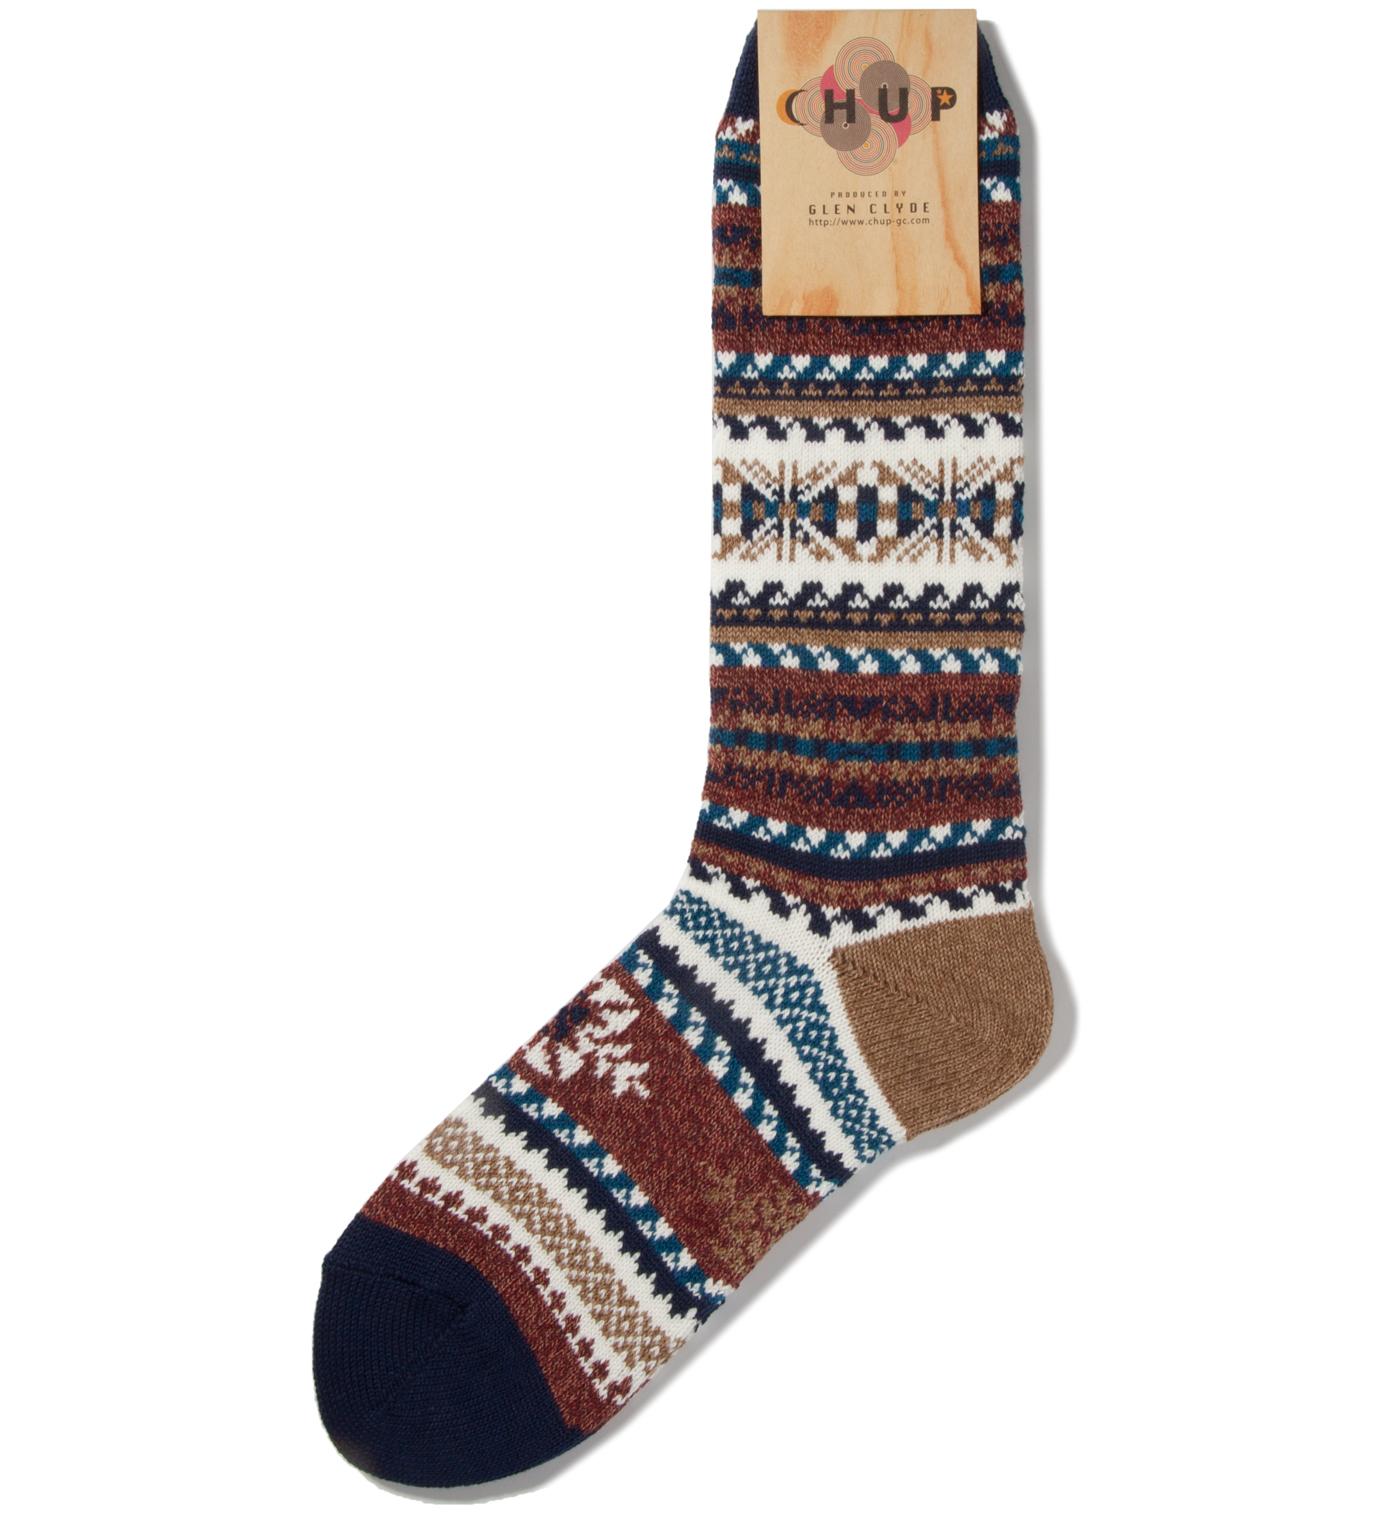 CHUP Navy Loimi Socks